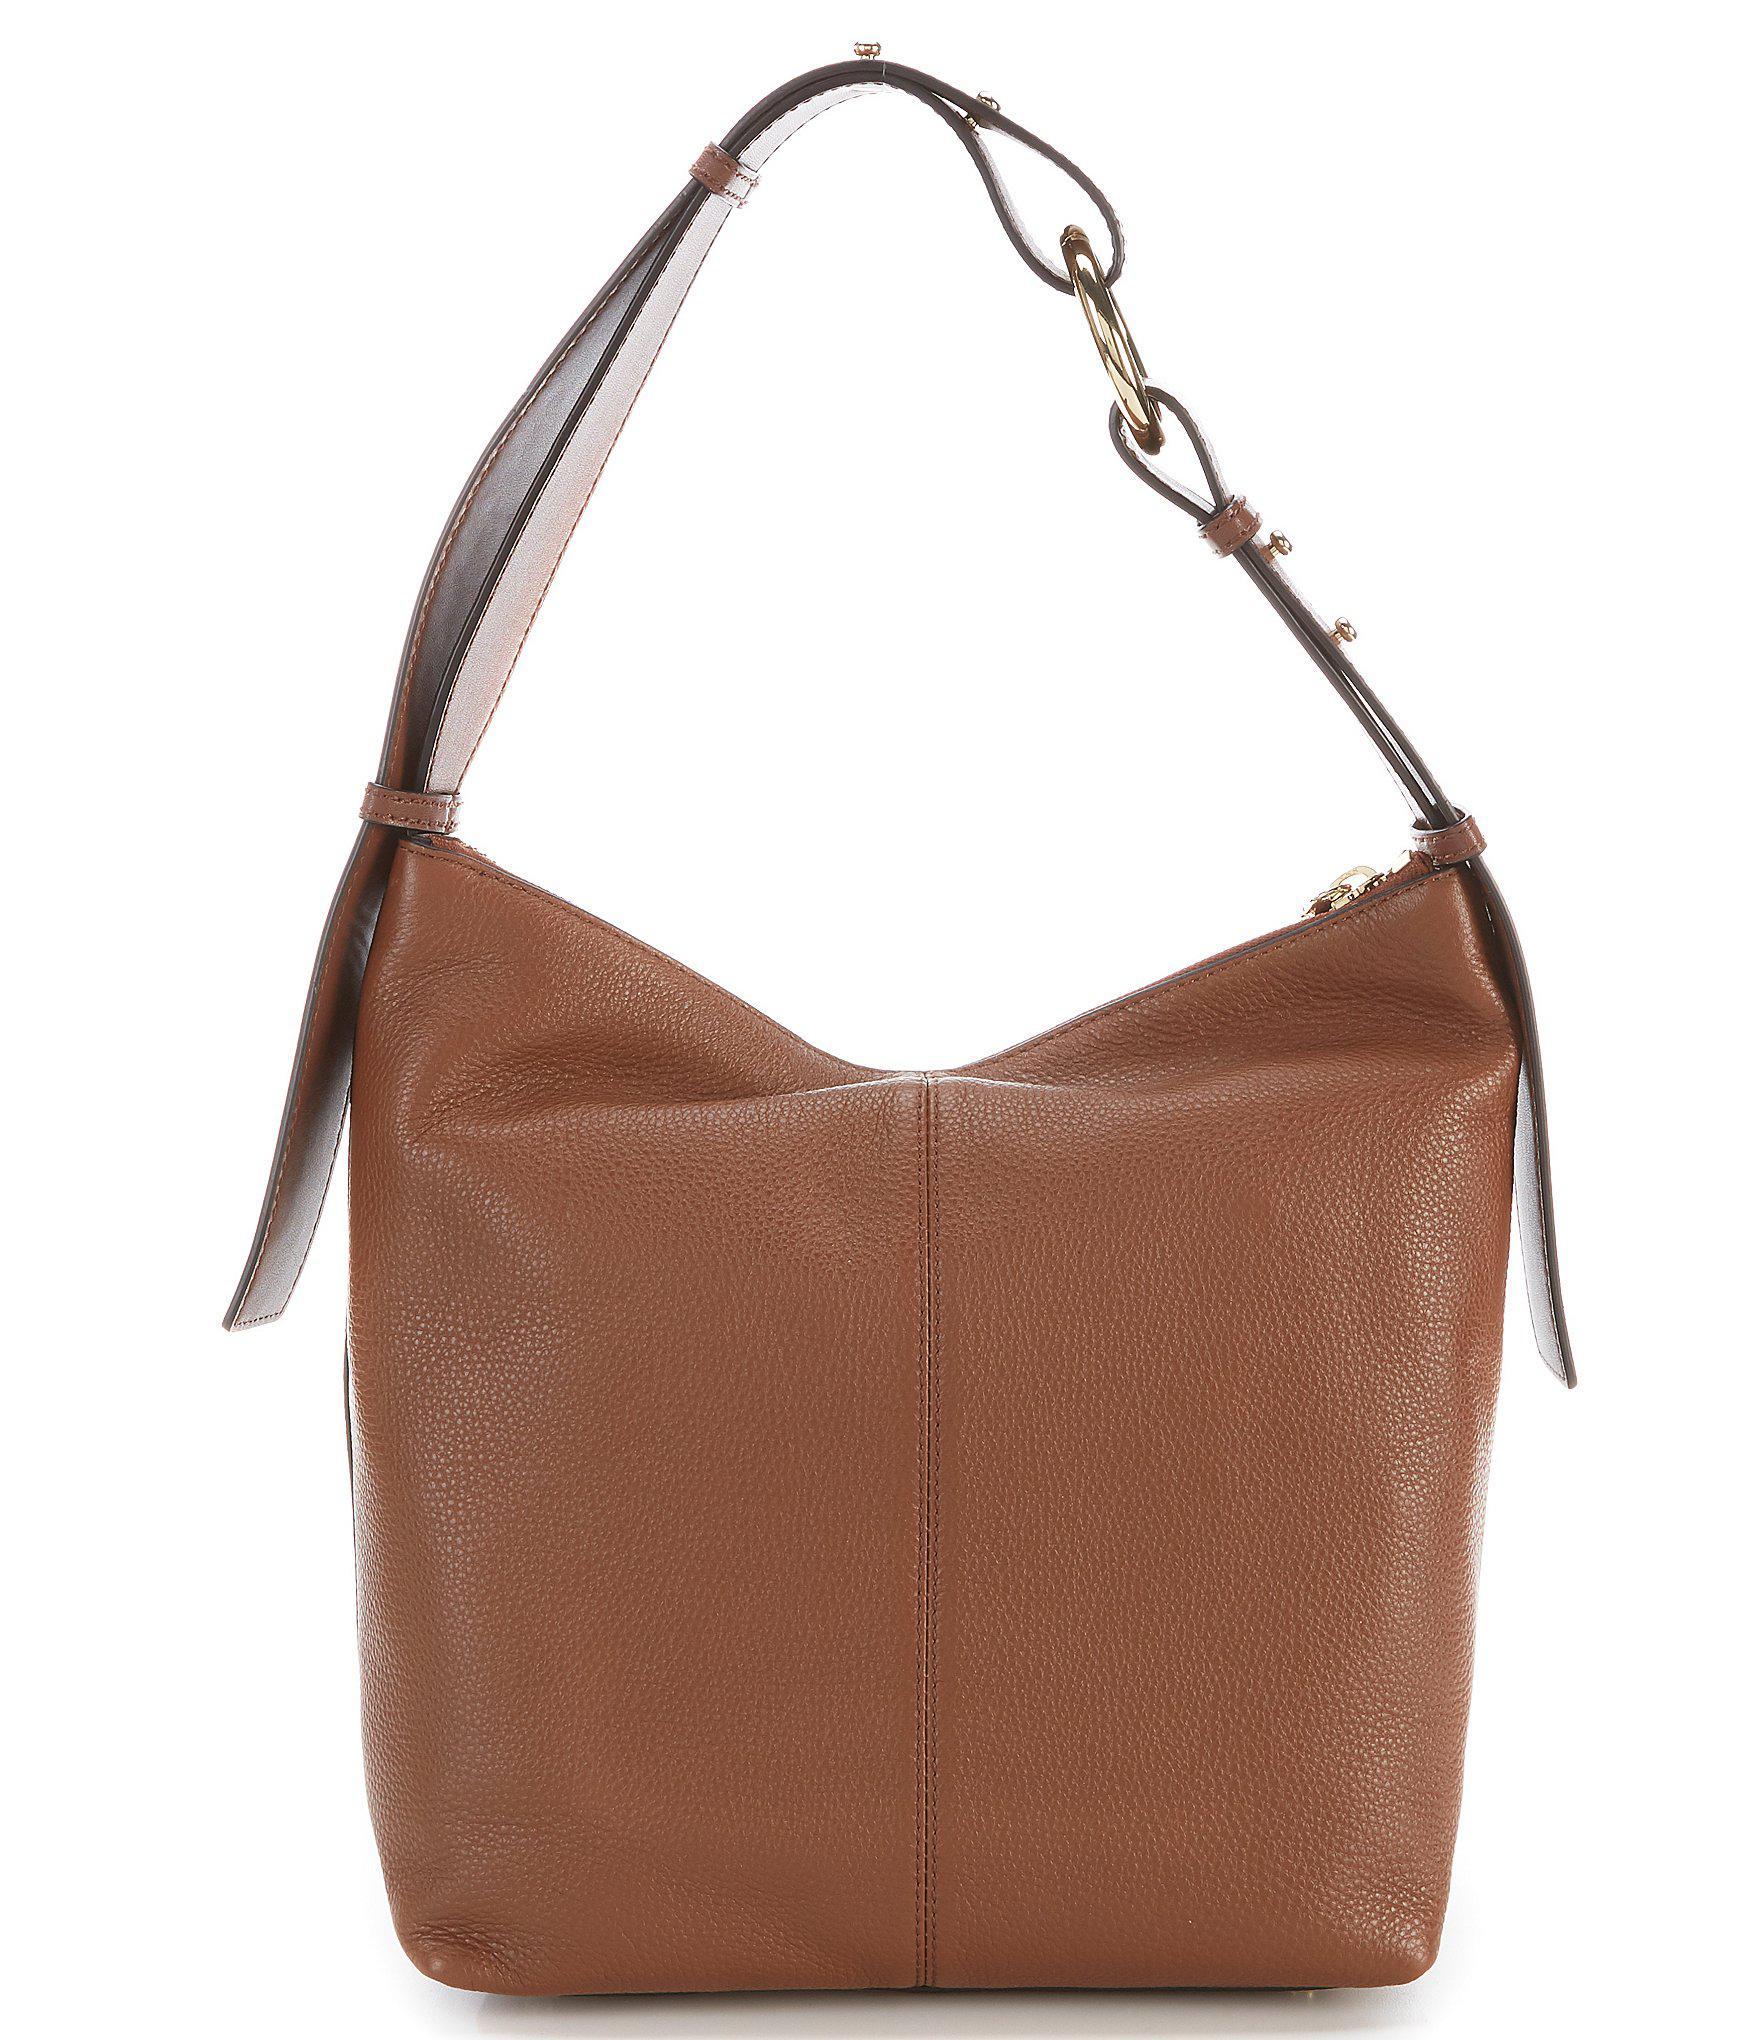 c42aff8fb675 Lyst - Calvin Klein Liana Pebble Hobo Bag in Brown